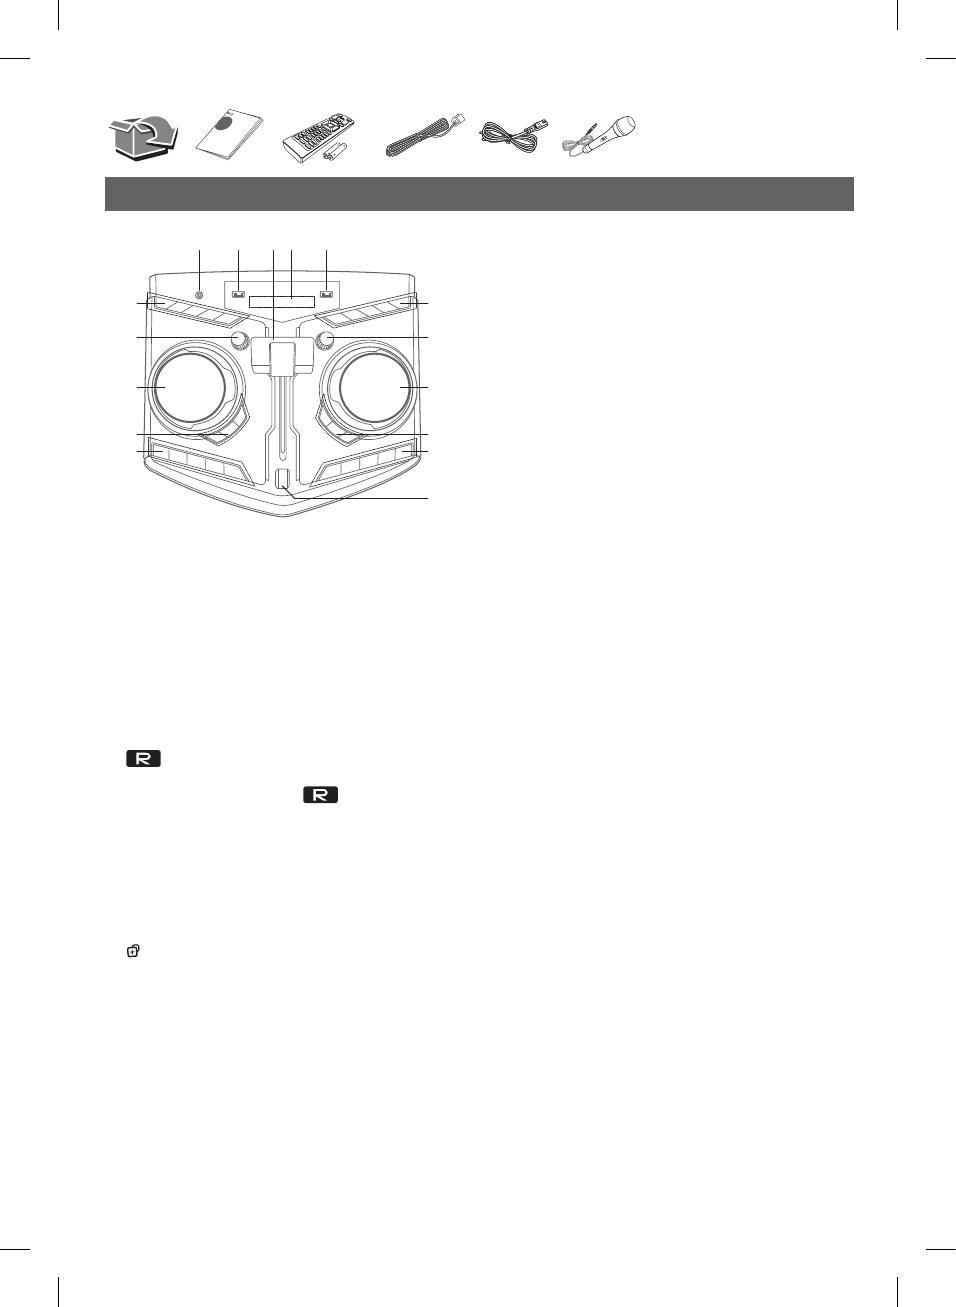 LG OJ98 User Manual Guide FB.DUSALLK SIMPLE SPA MFL69712110